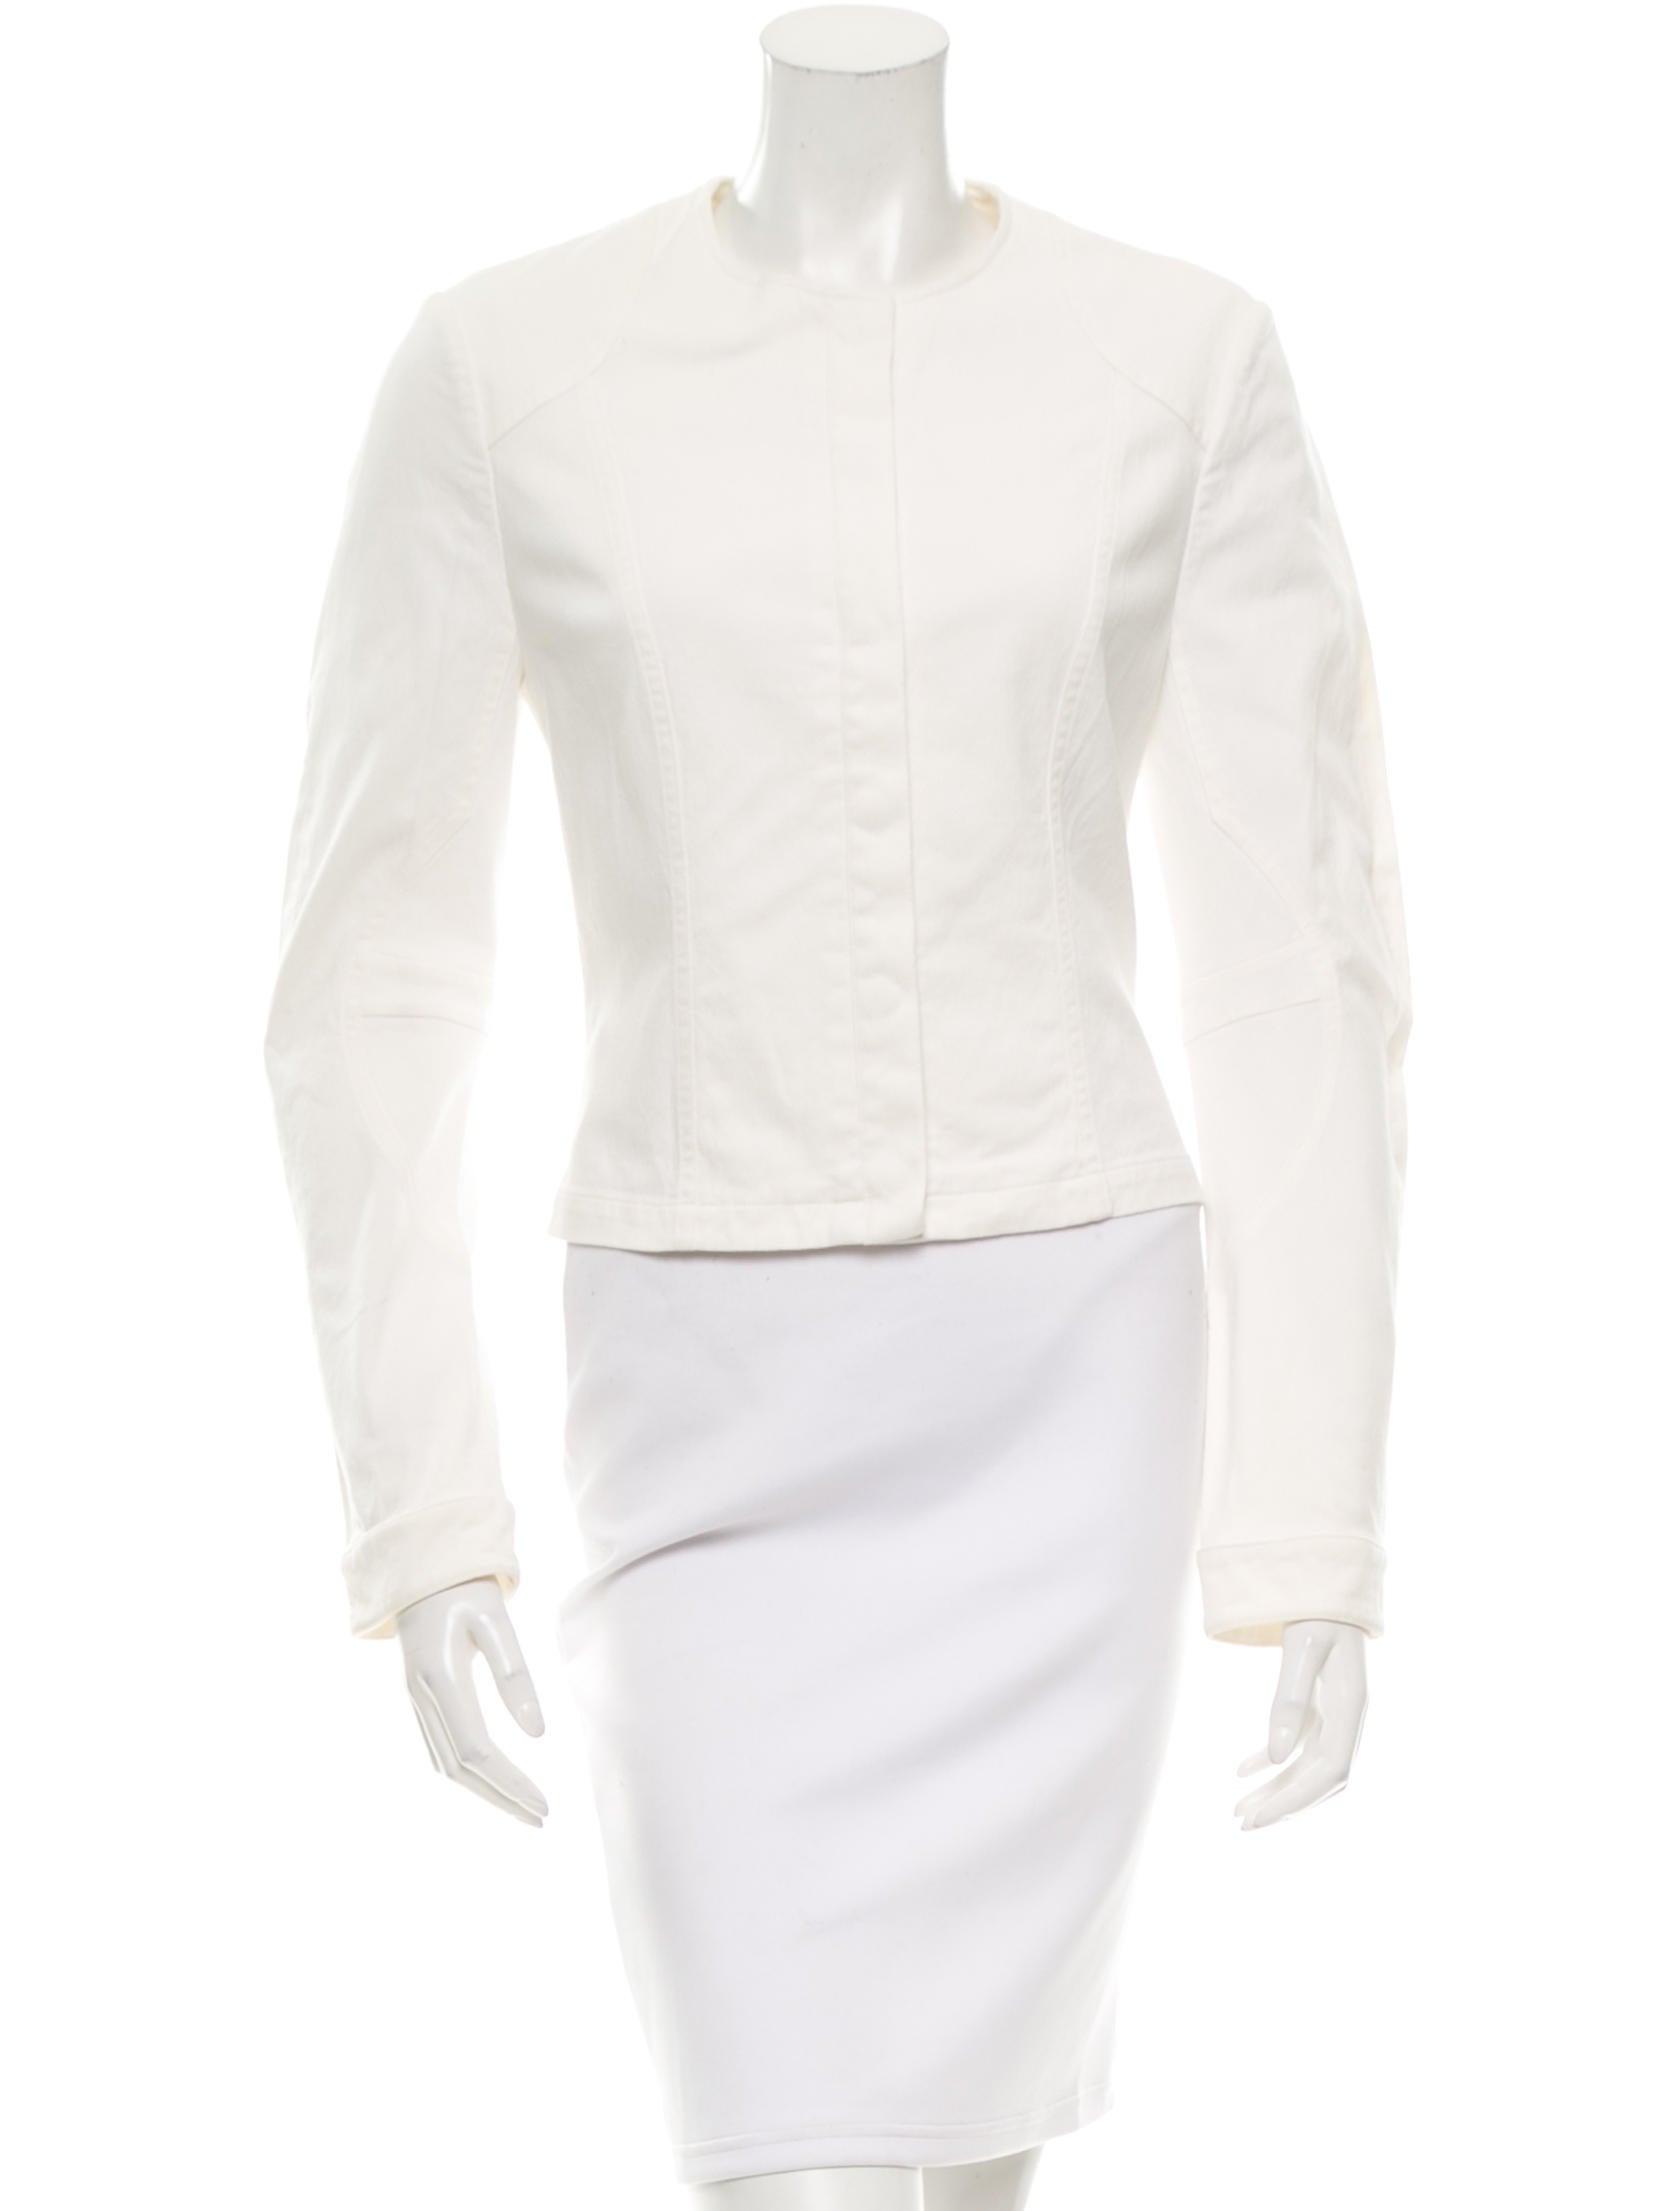 Christian dior button up denim jacket clothing for Christian dior button up shirt